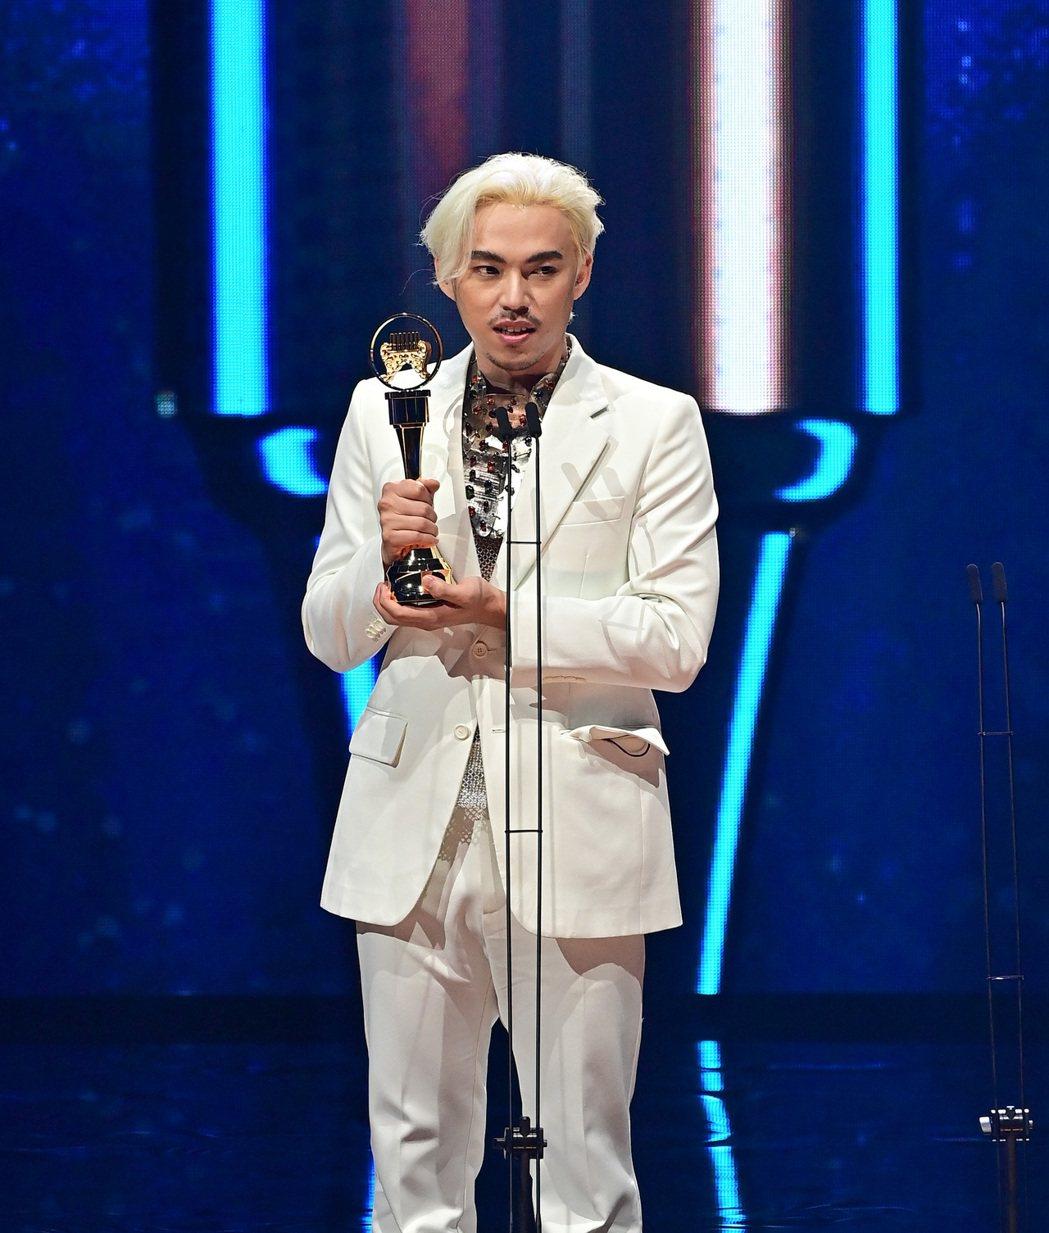 HUSH奪最佳作曲人獎。圖/台視提供